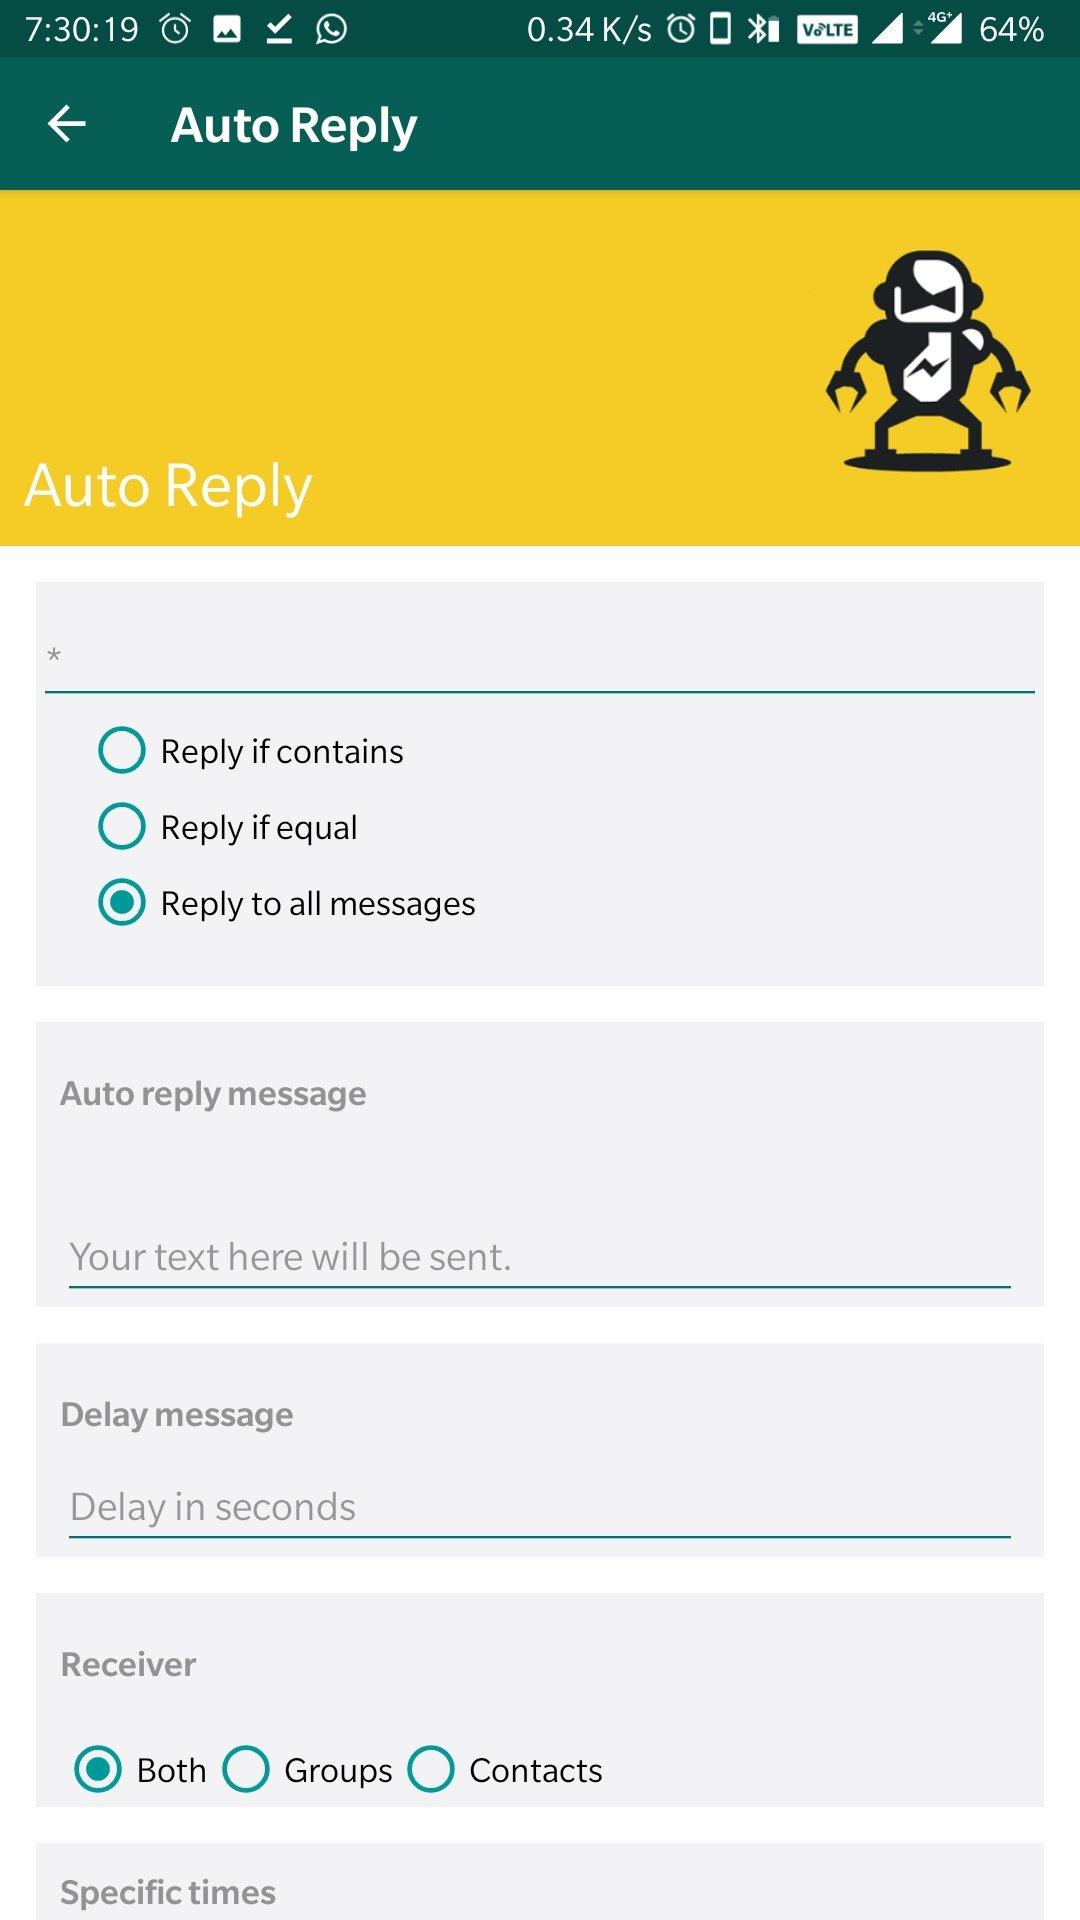 WhatsApp Aero APK Downlaod v200.200.20 [200201] Latest Version